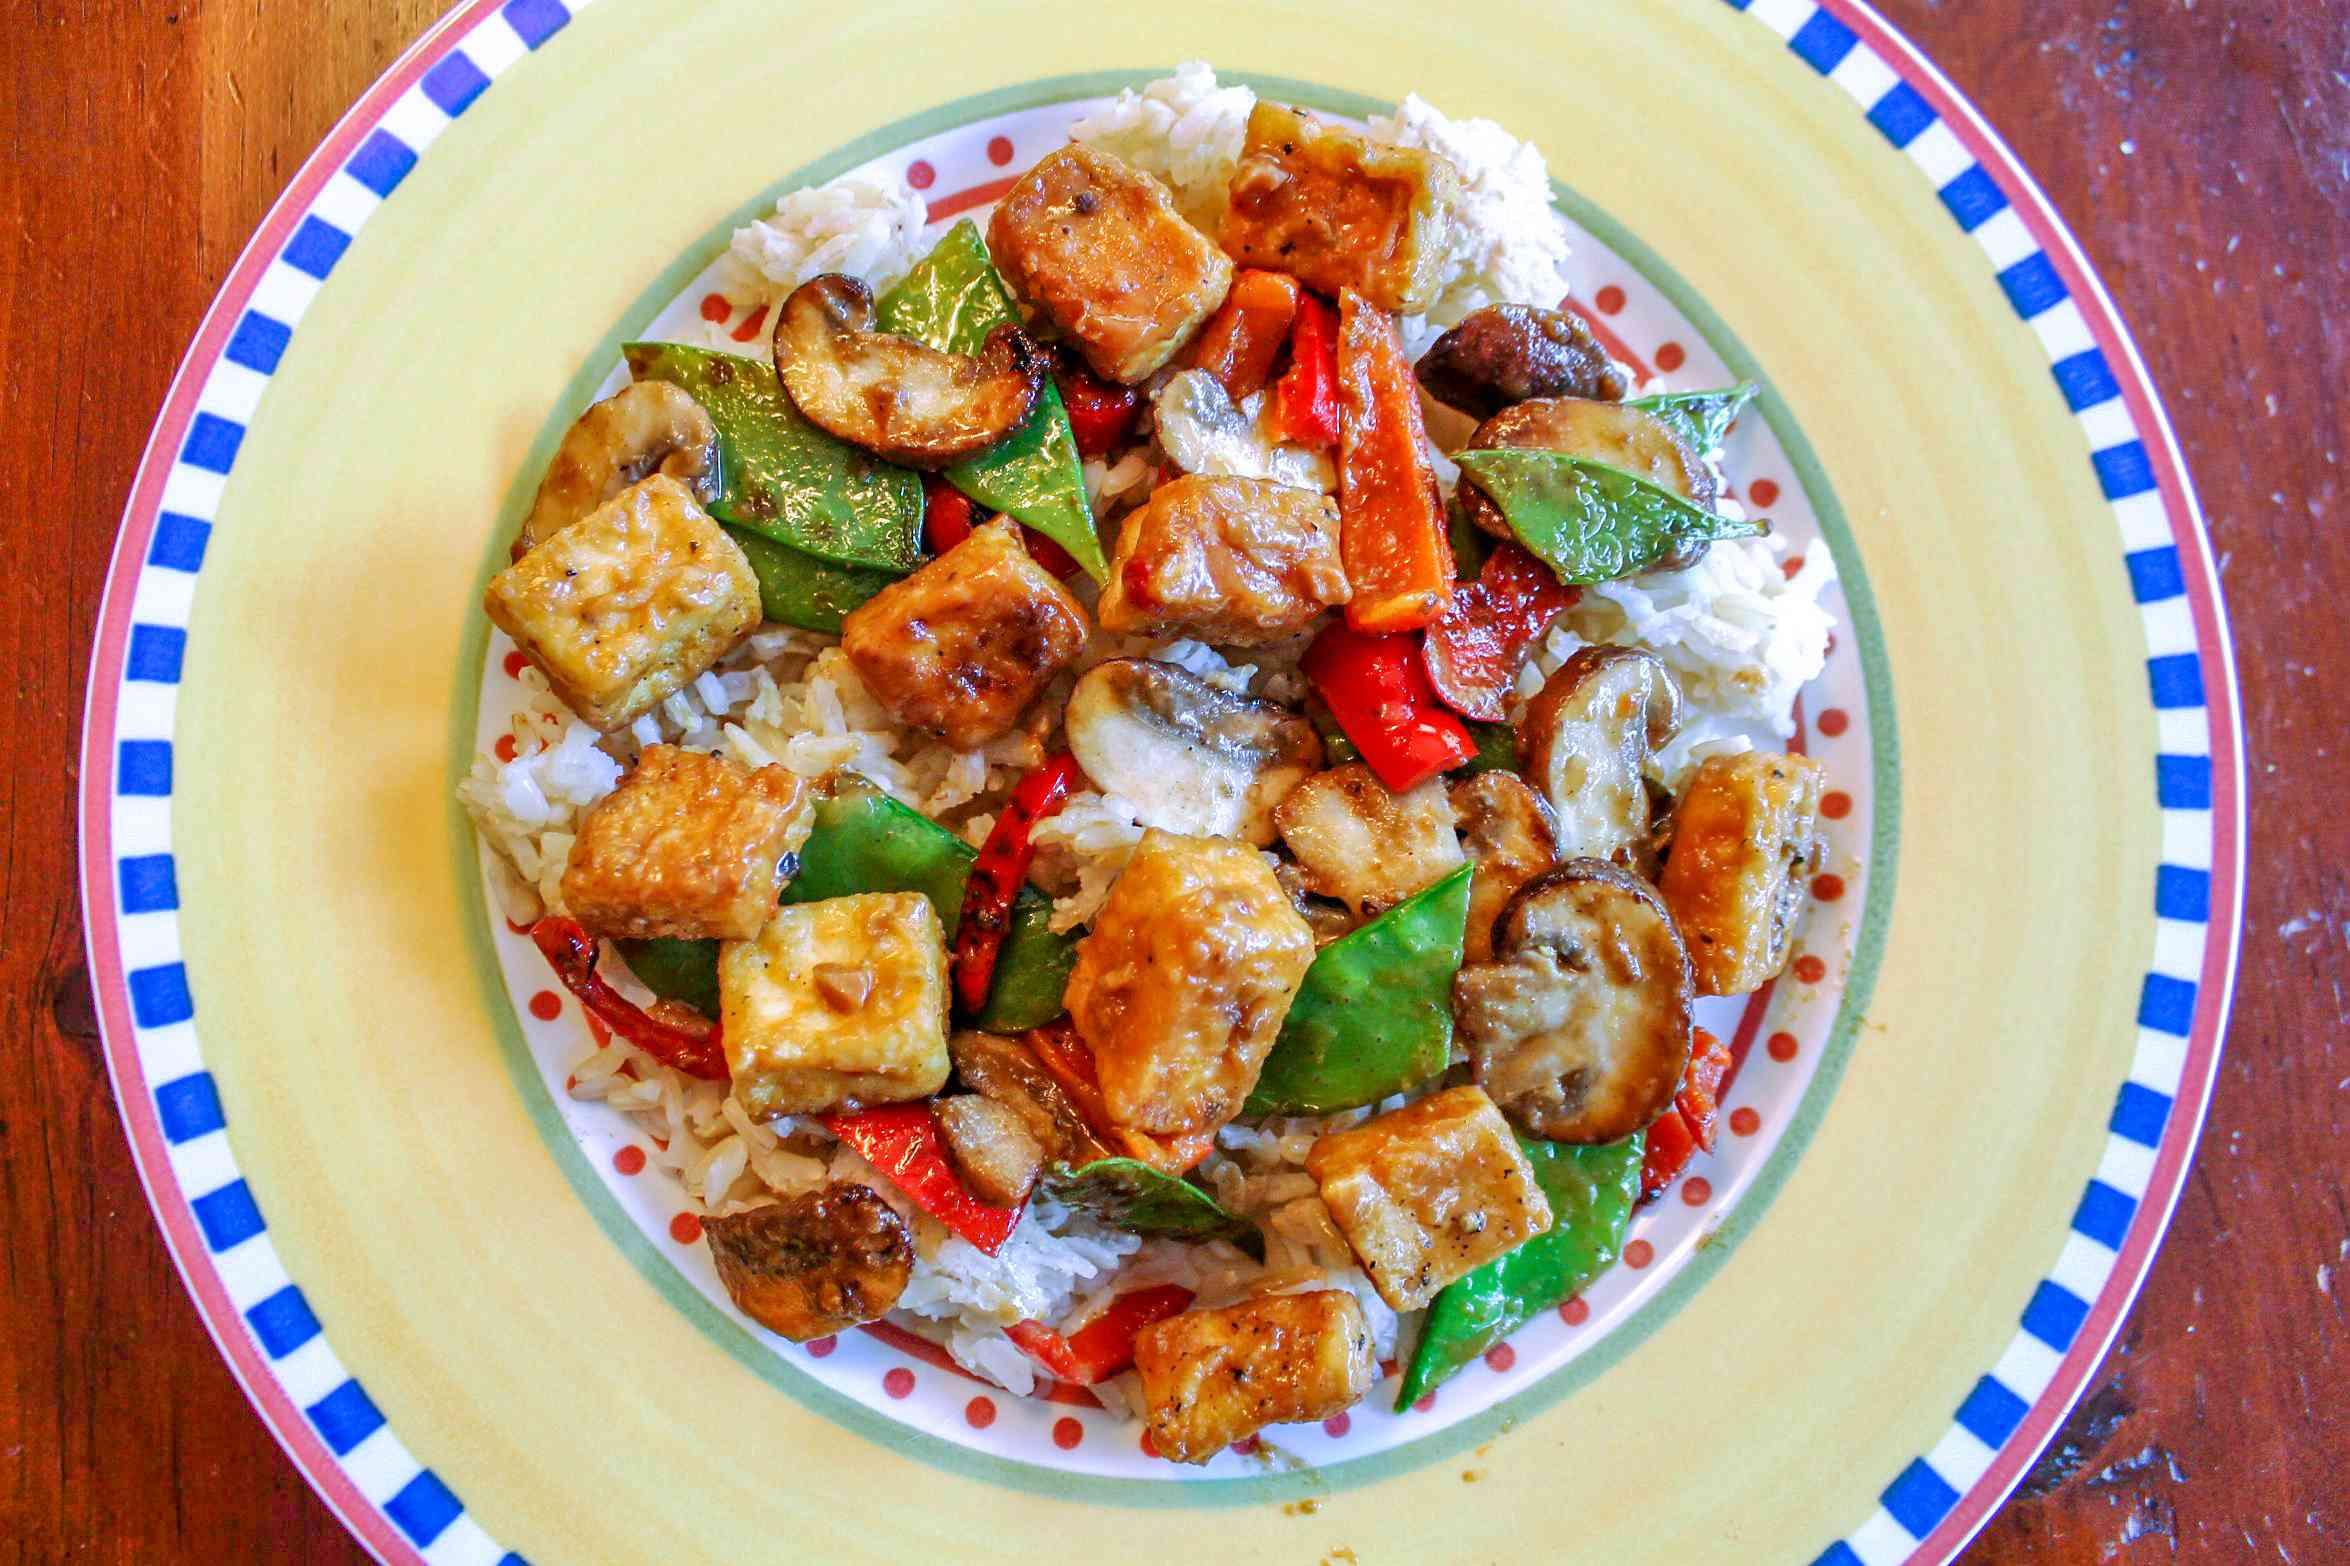 Vegan Tofu Stir-Fry With Vegetables in Peanut Sauce